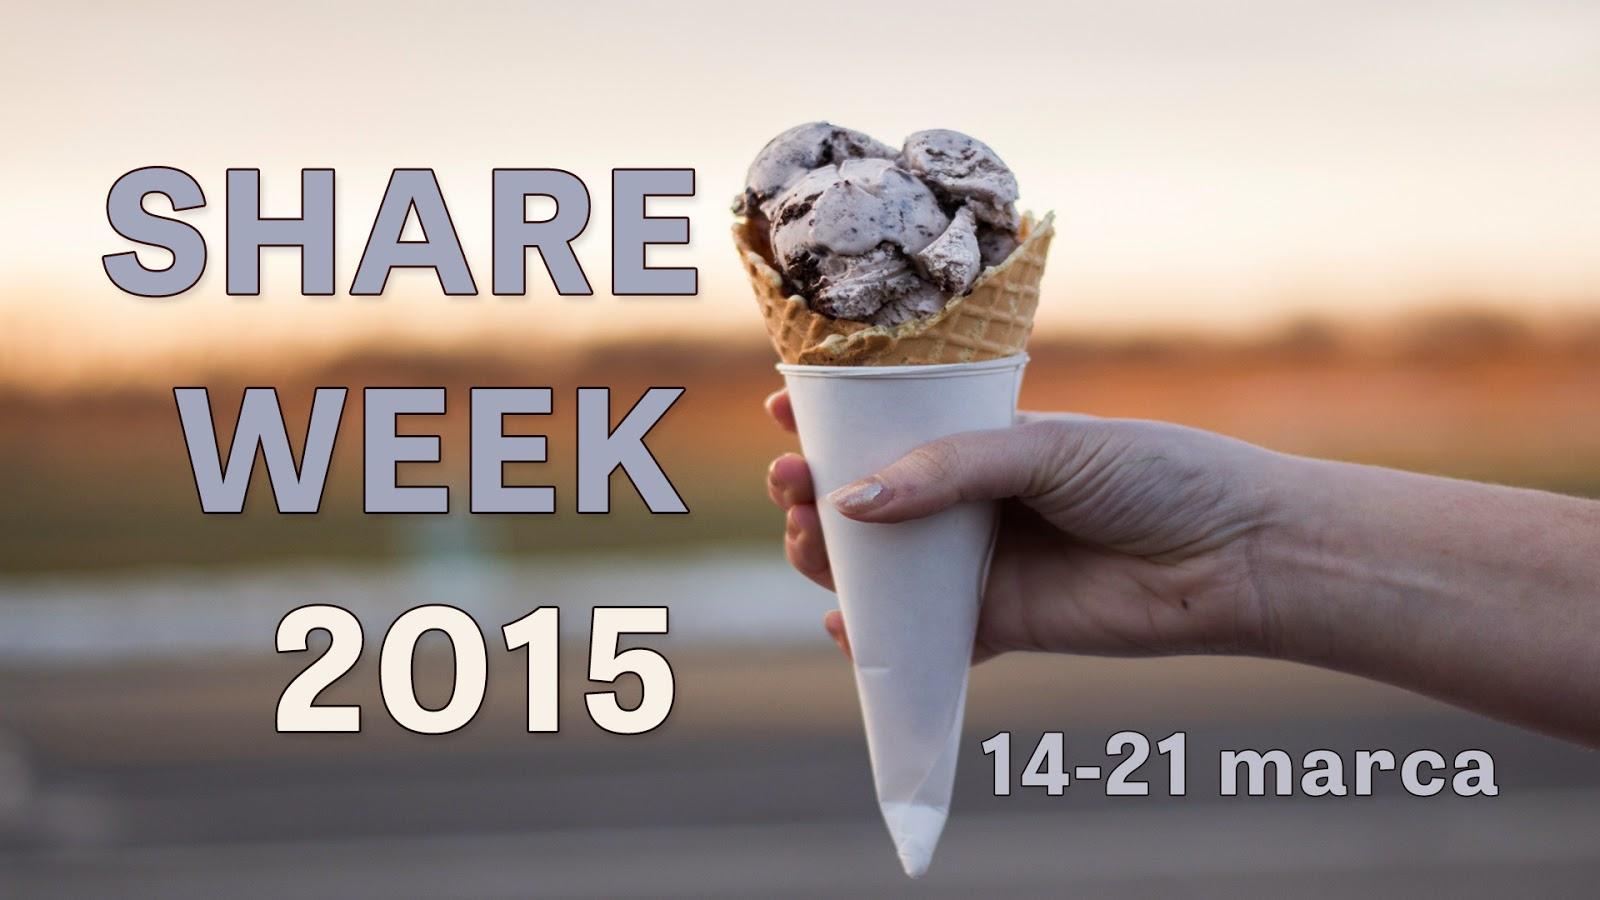 Share Week 2015 - blogi, które polecam